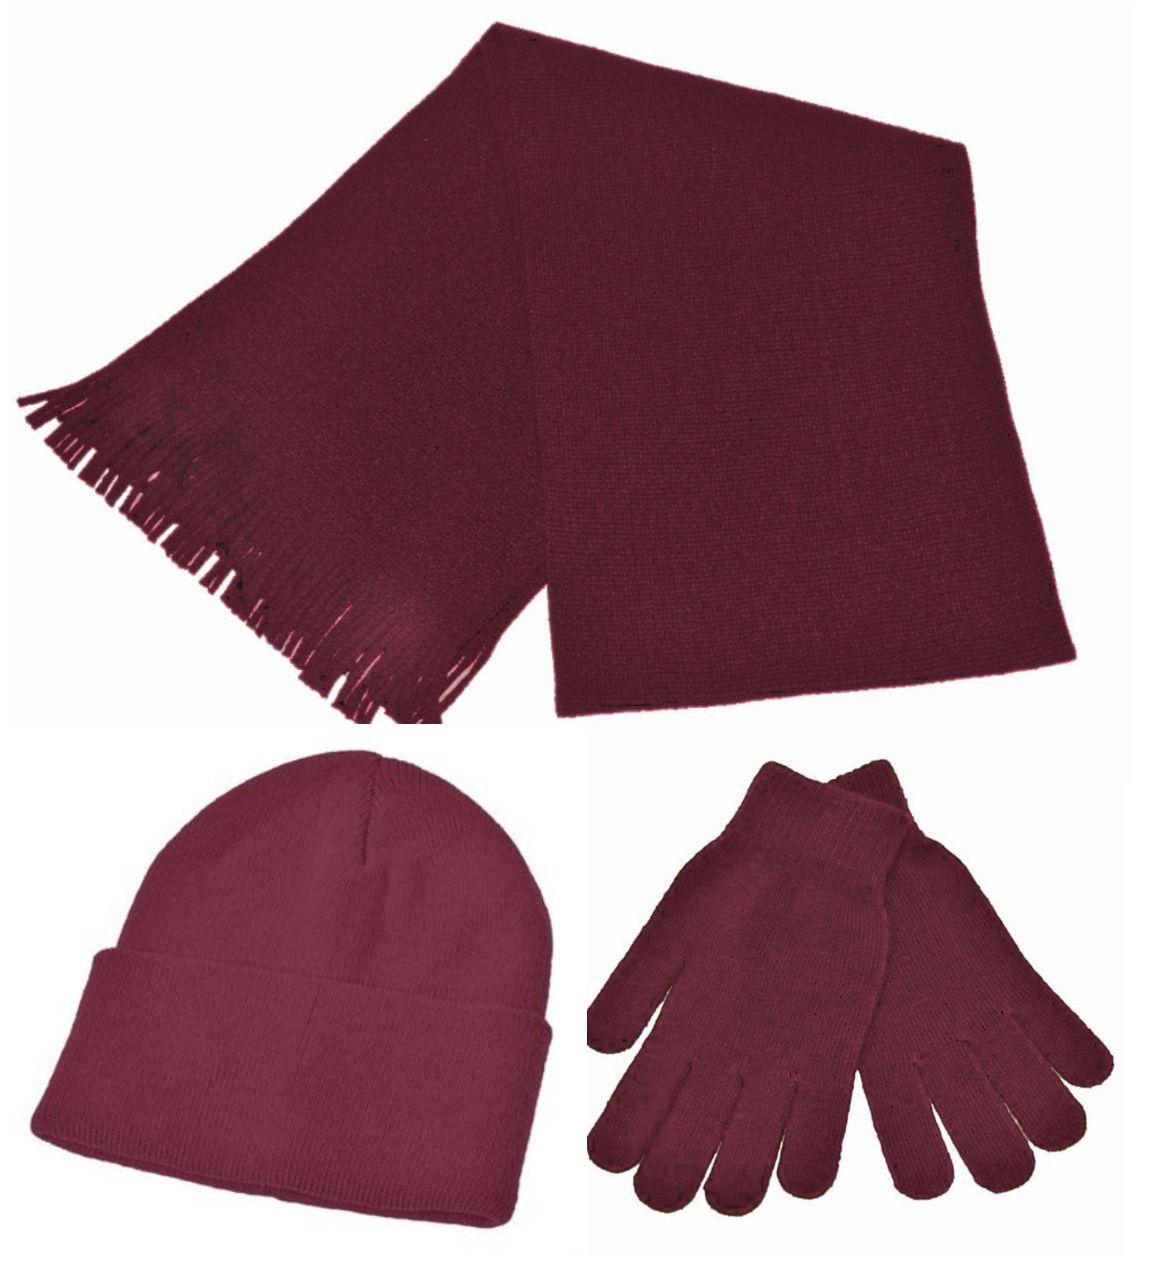 Knitted Winter Kit Mar